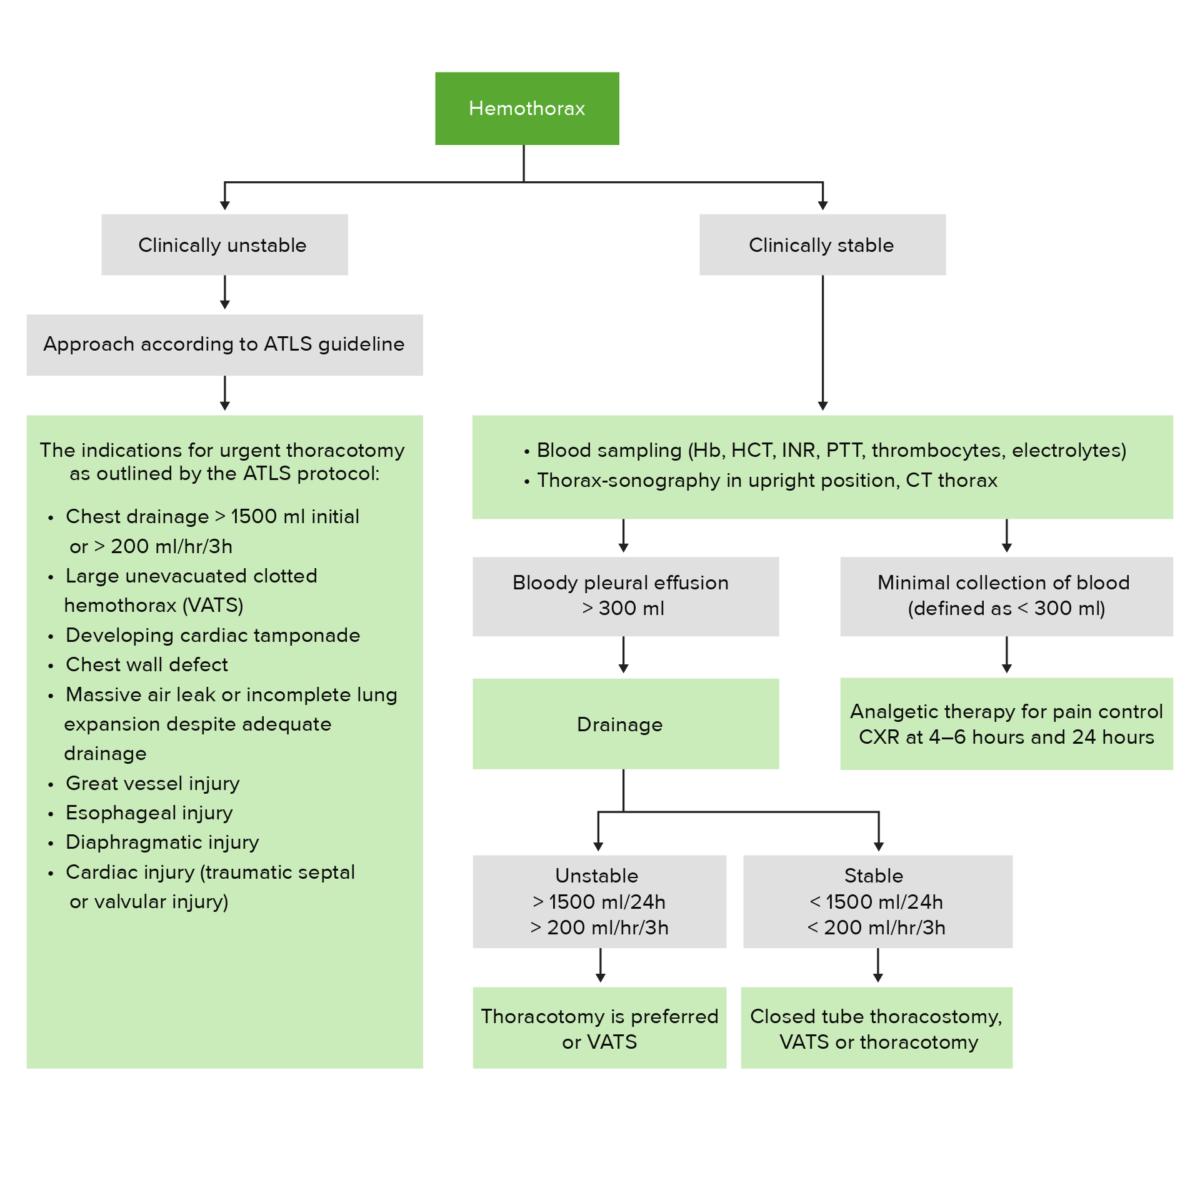 Hemothorax management